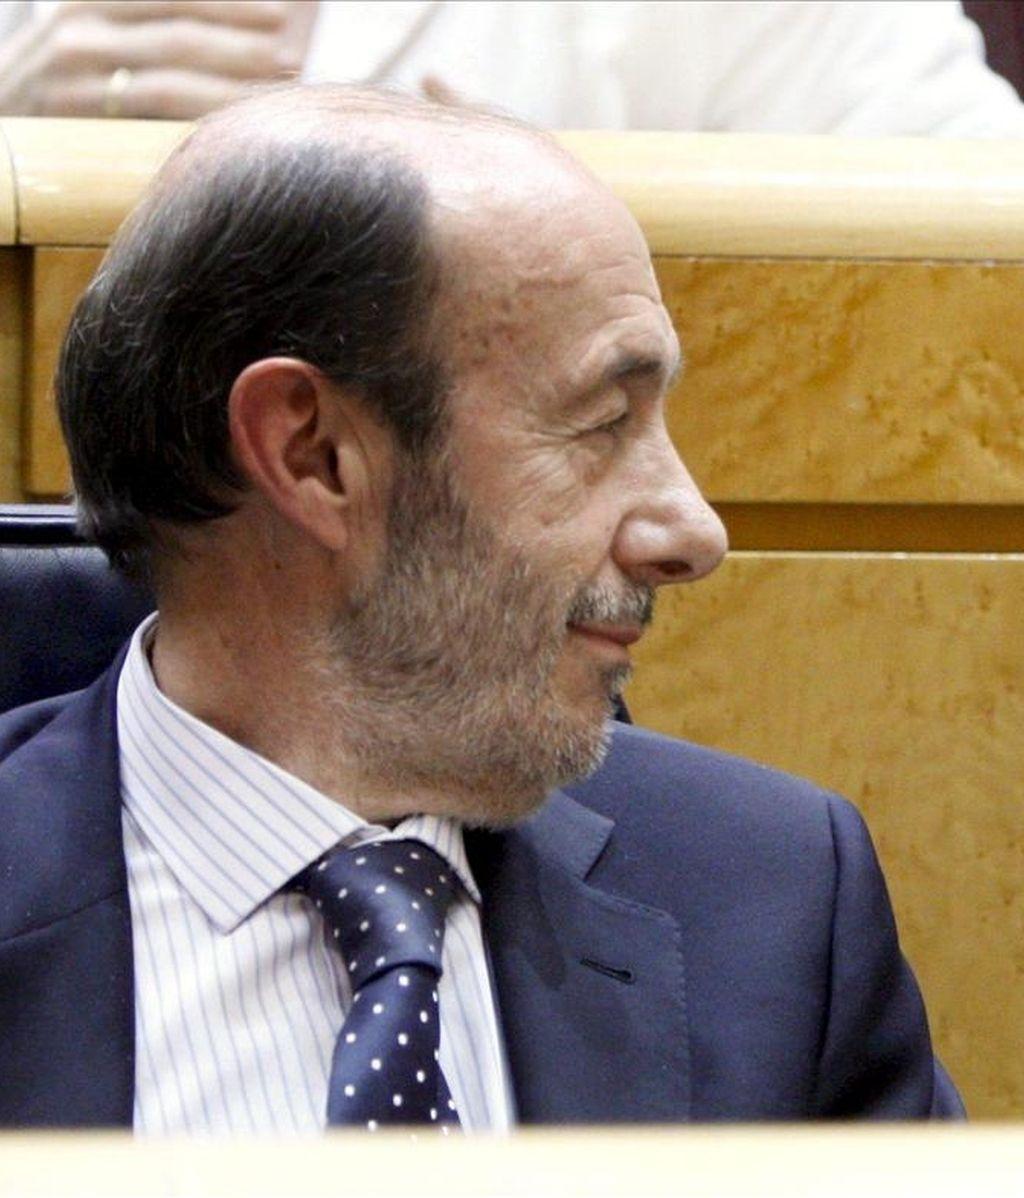 El vicepresidente primero, Alfredo Pérez Rubalcaba. EFE/Archivo